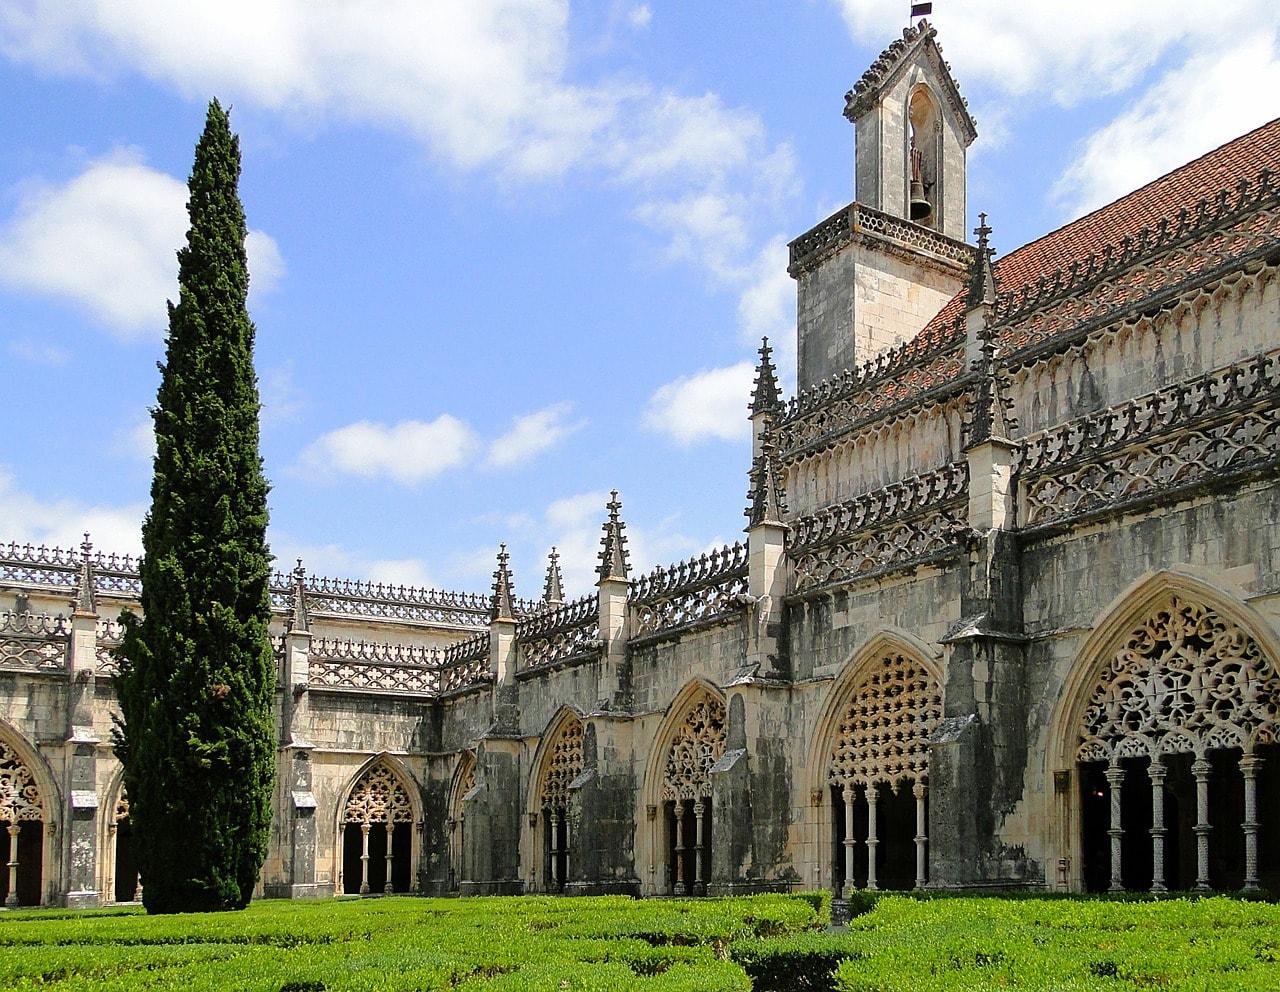 https://pixabay.com/en/jeronimos-monastery-batalha-portugal-502815/